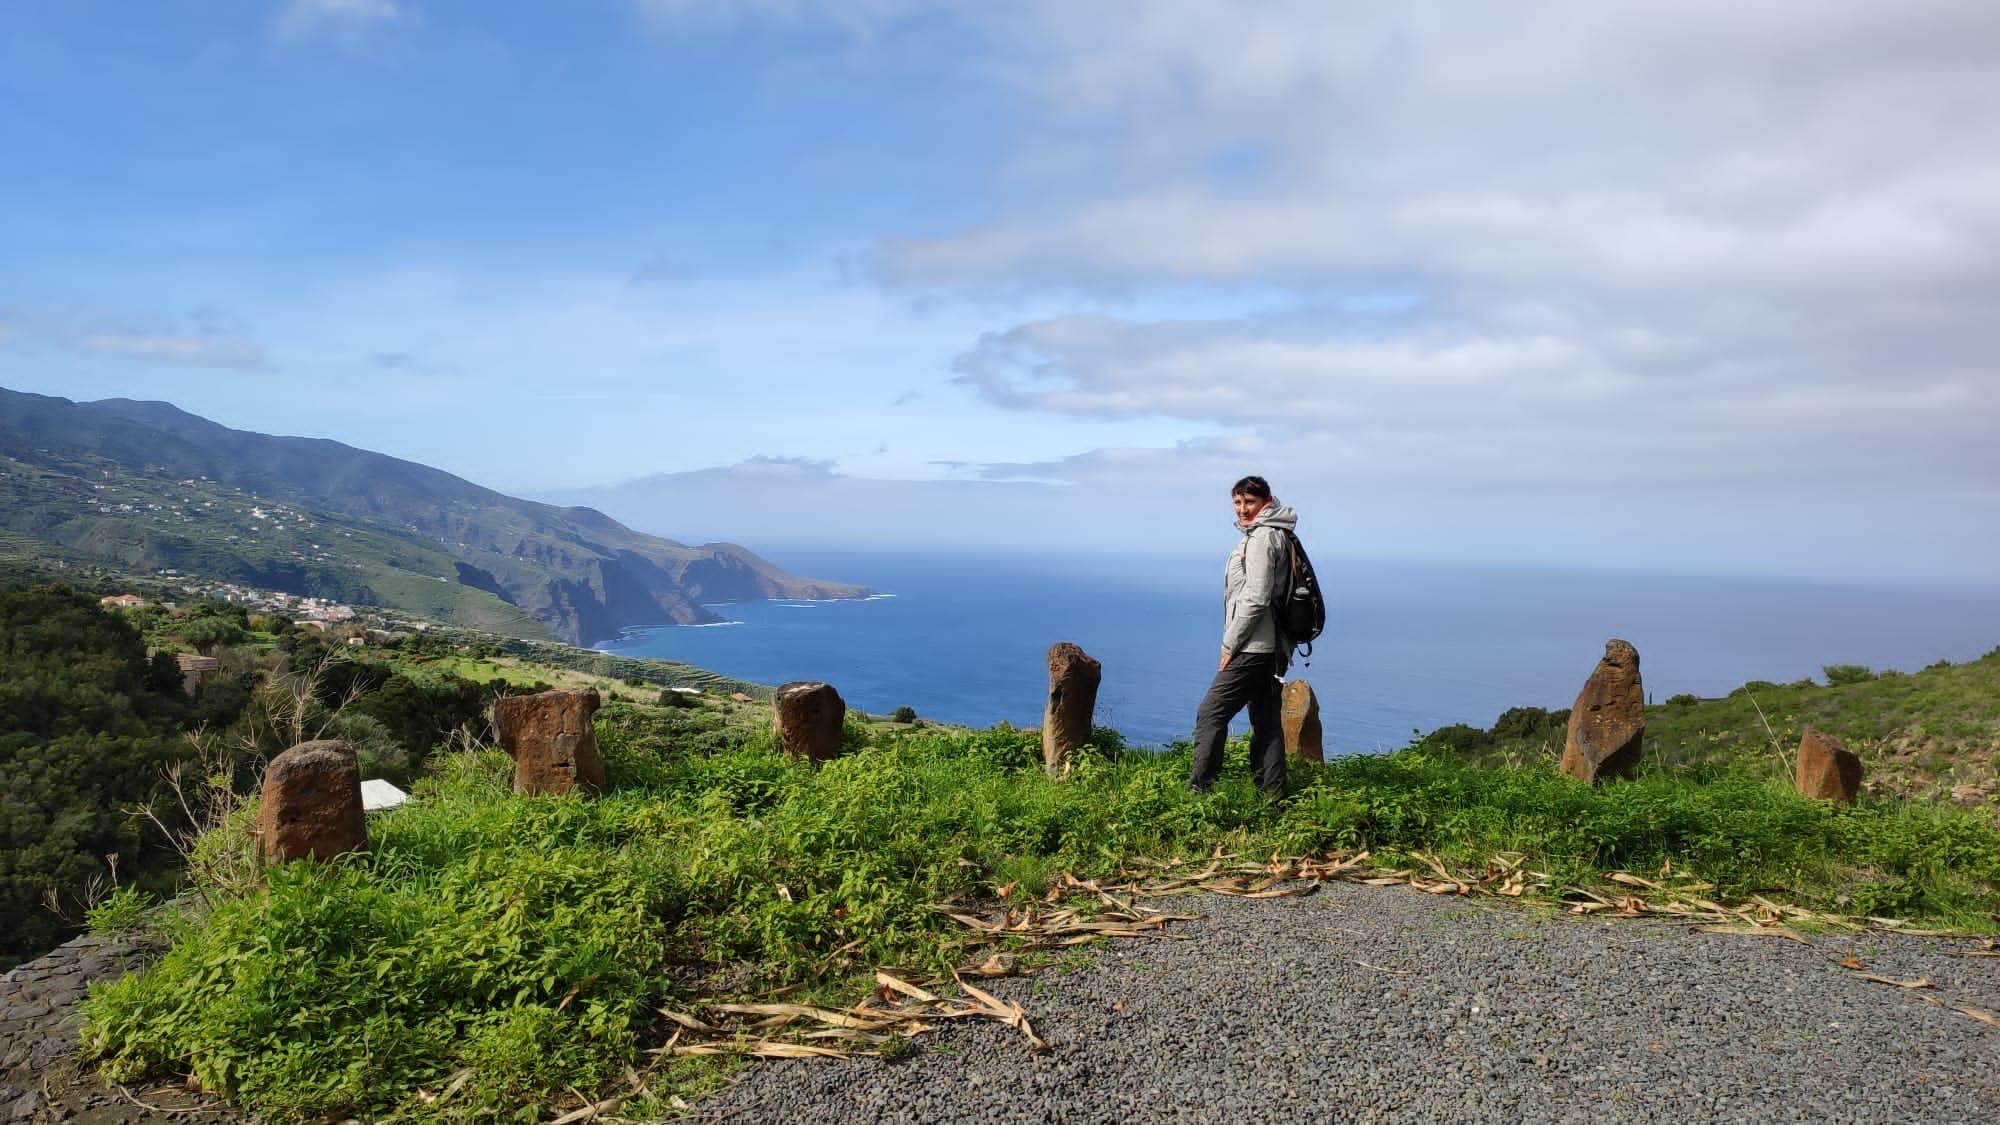 Guida turistica locale isole canarie la palma tour visite guidate